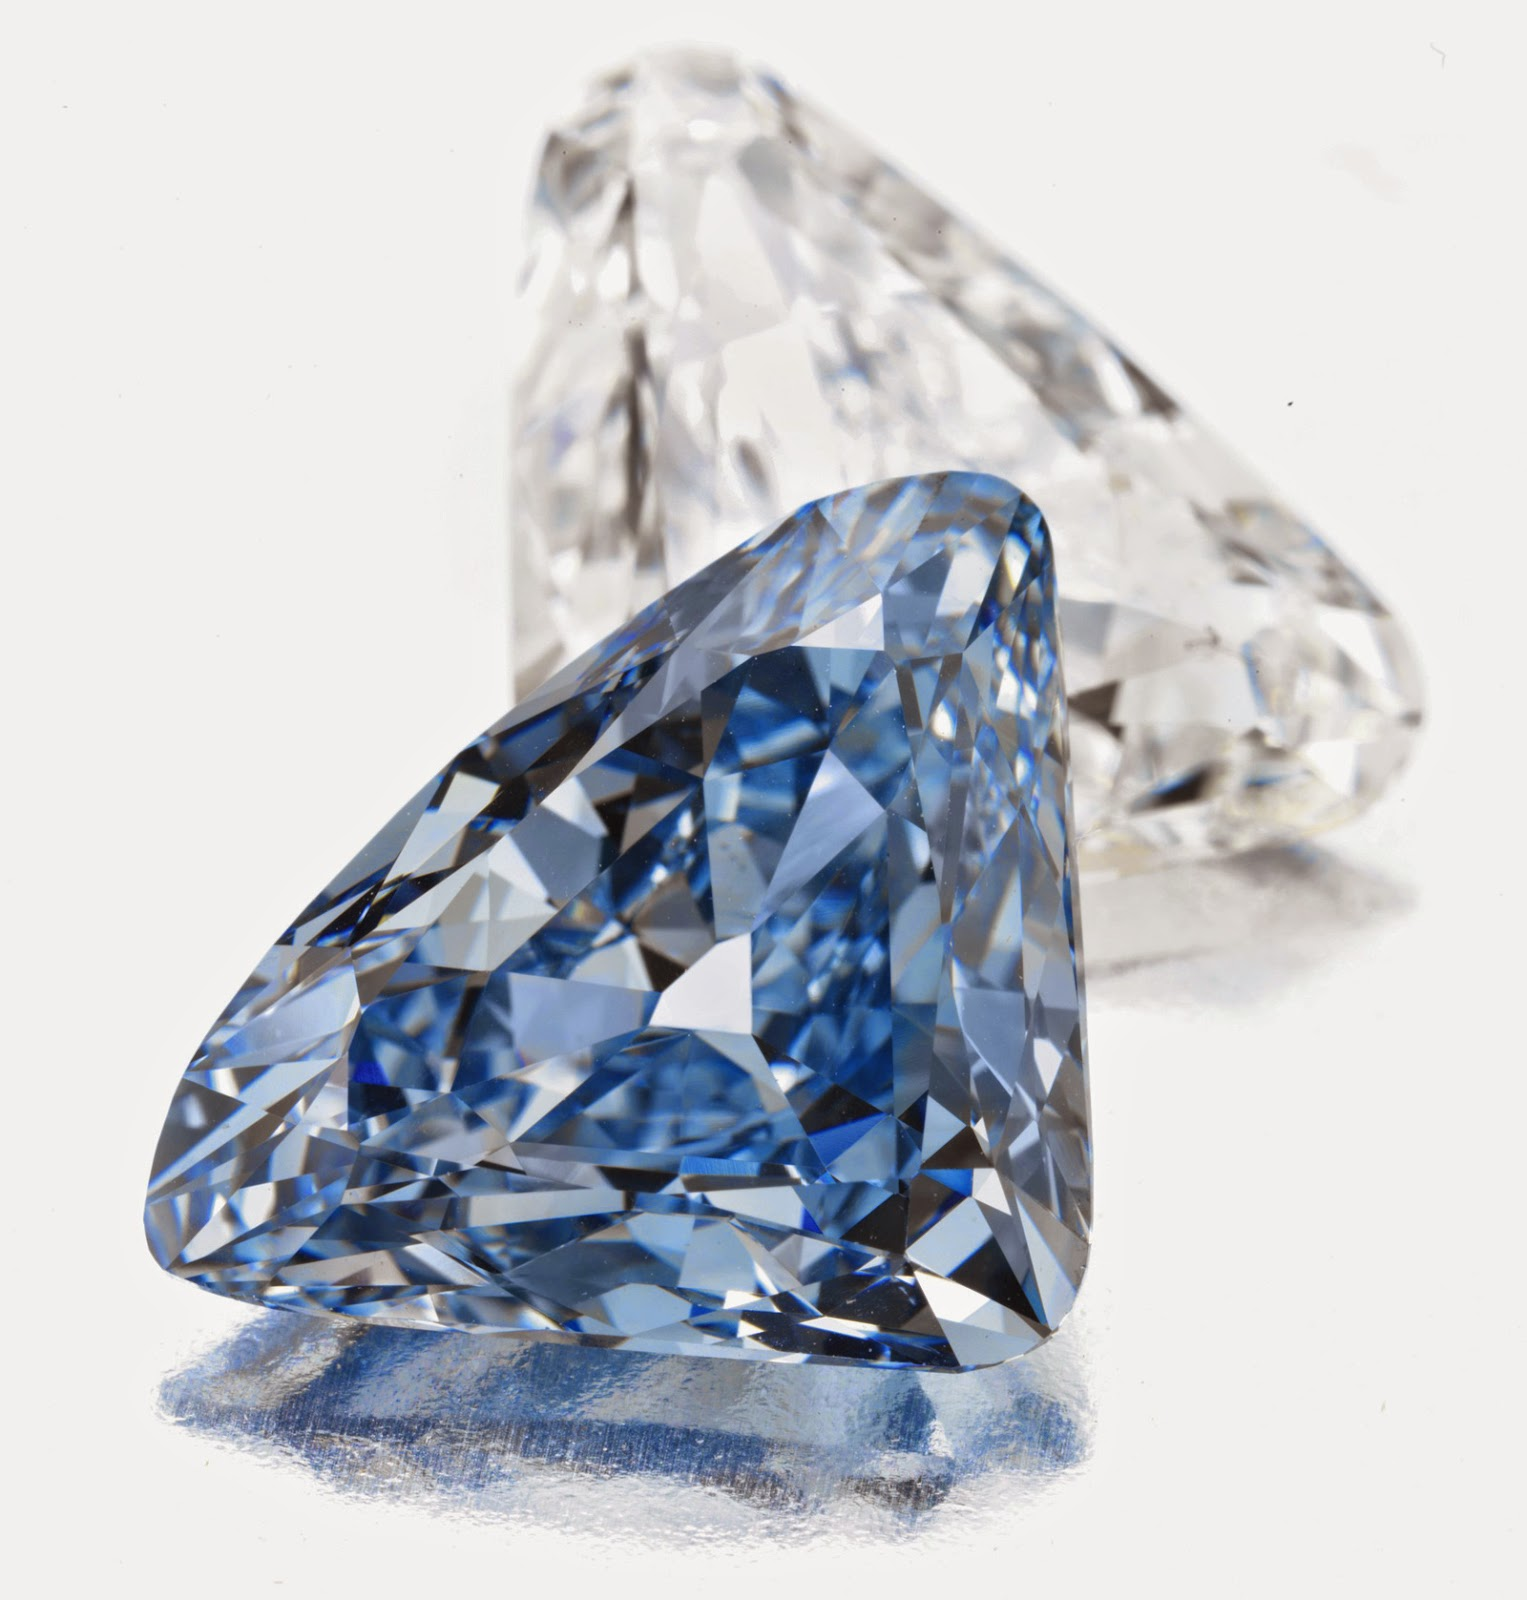 Bvlgari Two Stone Diamond